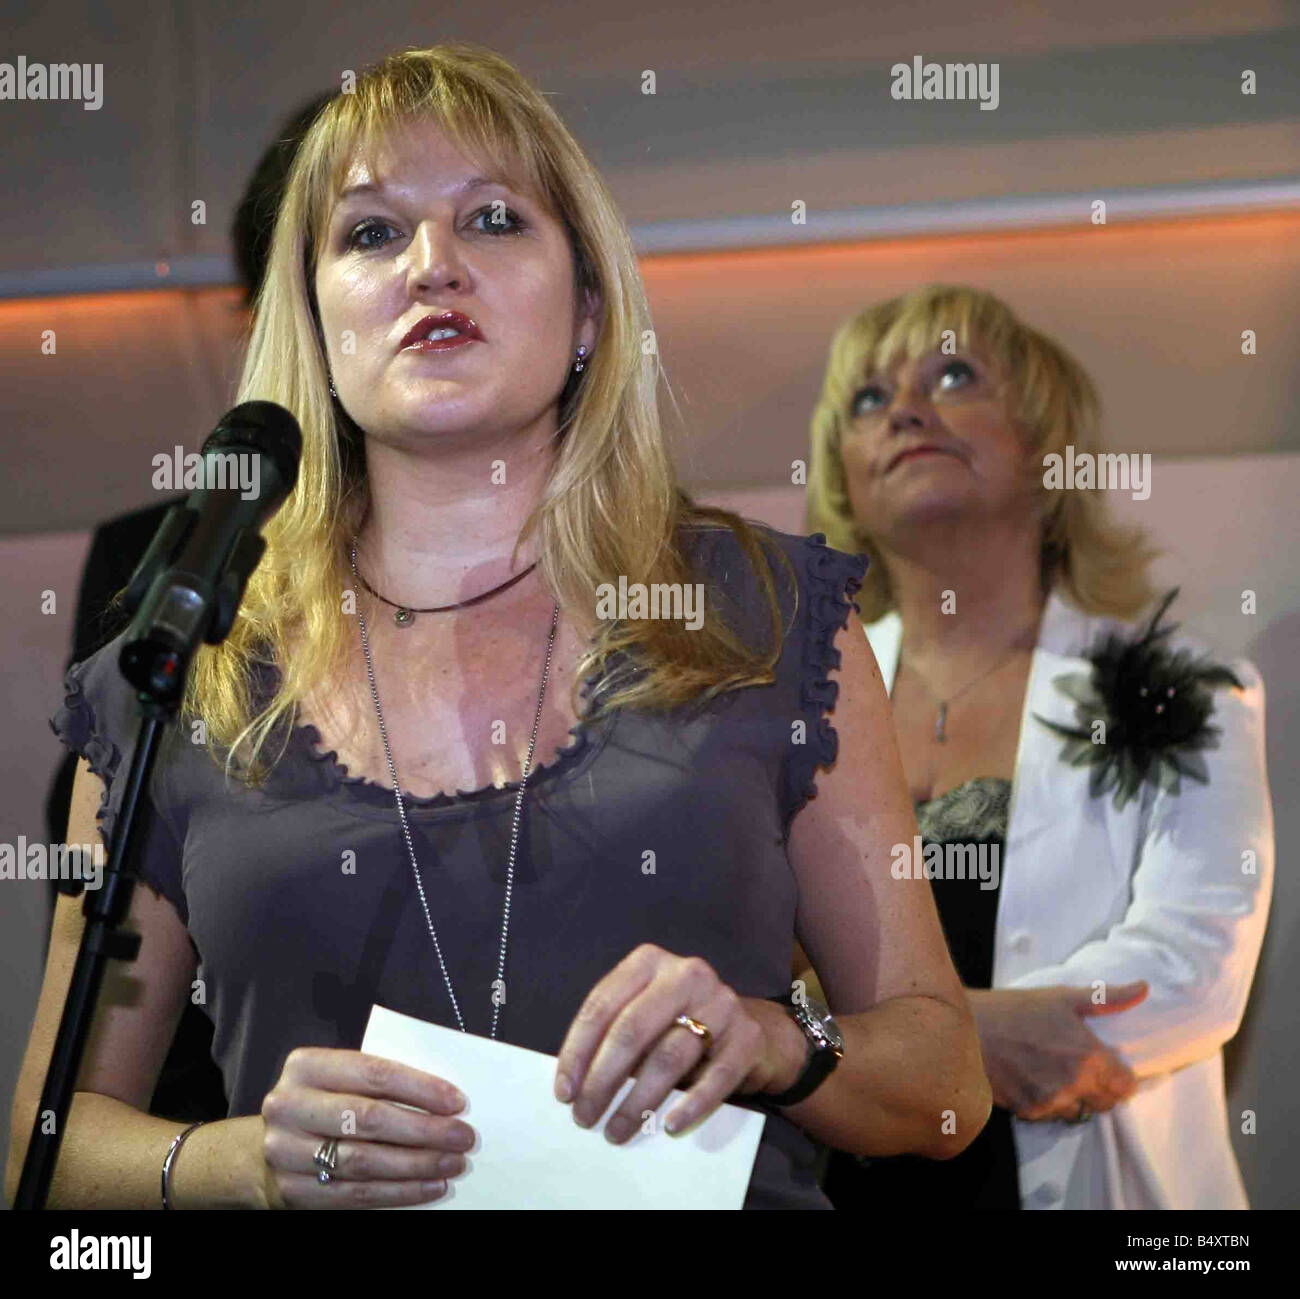 Amanda Ross Managing Director CACTUS TV AT THE GALAXY BOOK AWARDS SHORT LIST 7 MATCH 2007 PICTURE IAN VOGLER - Stock Image